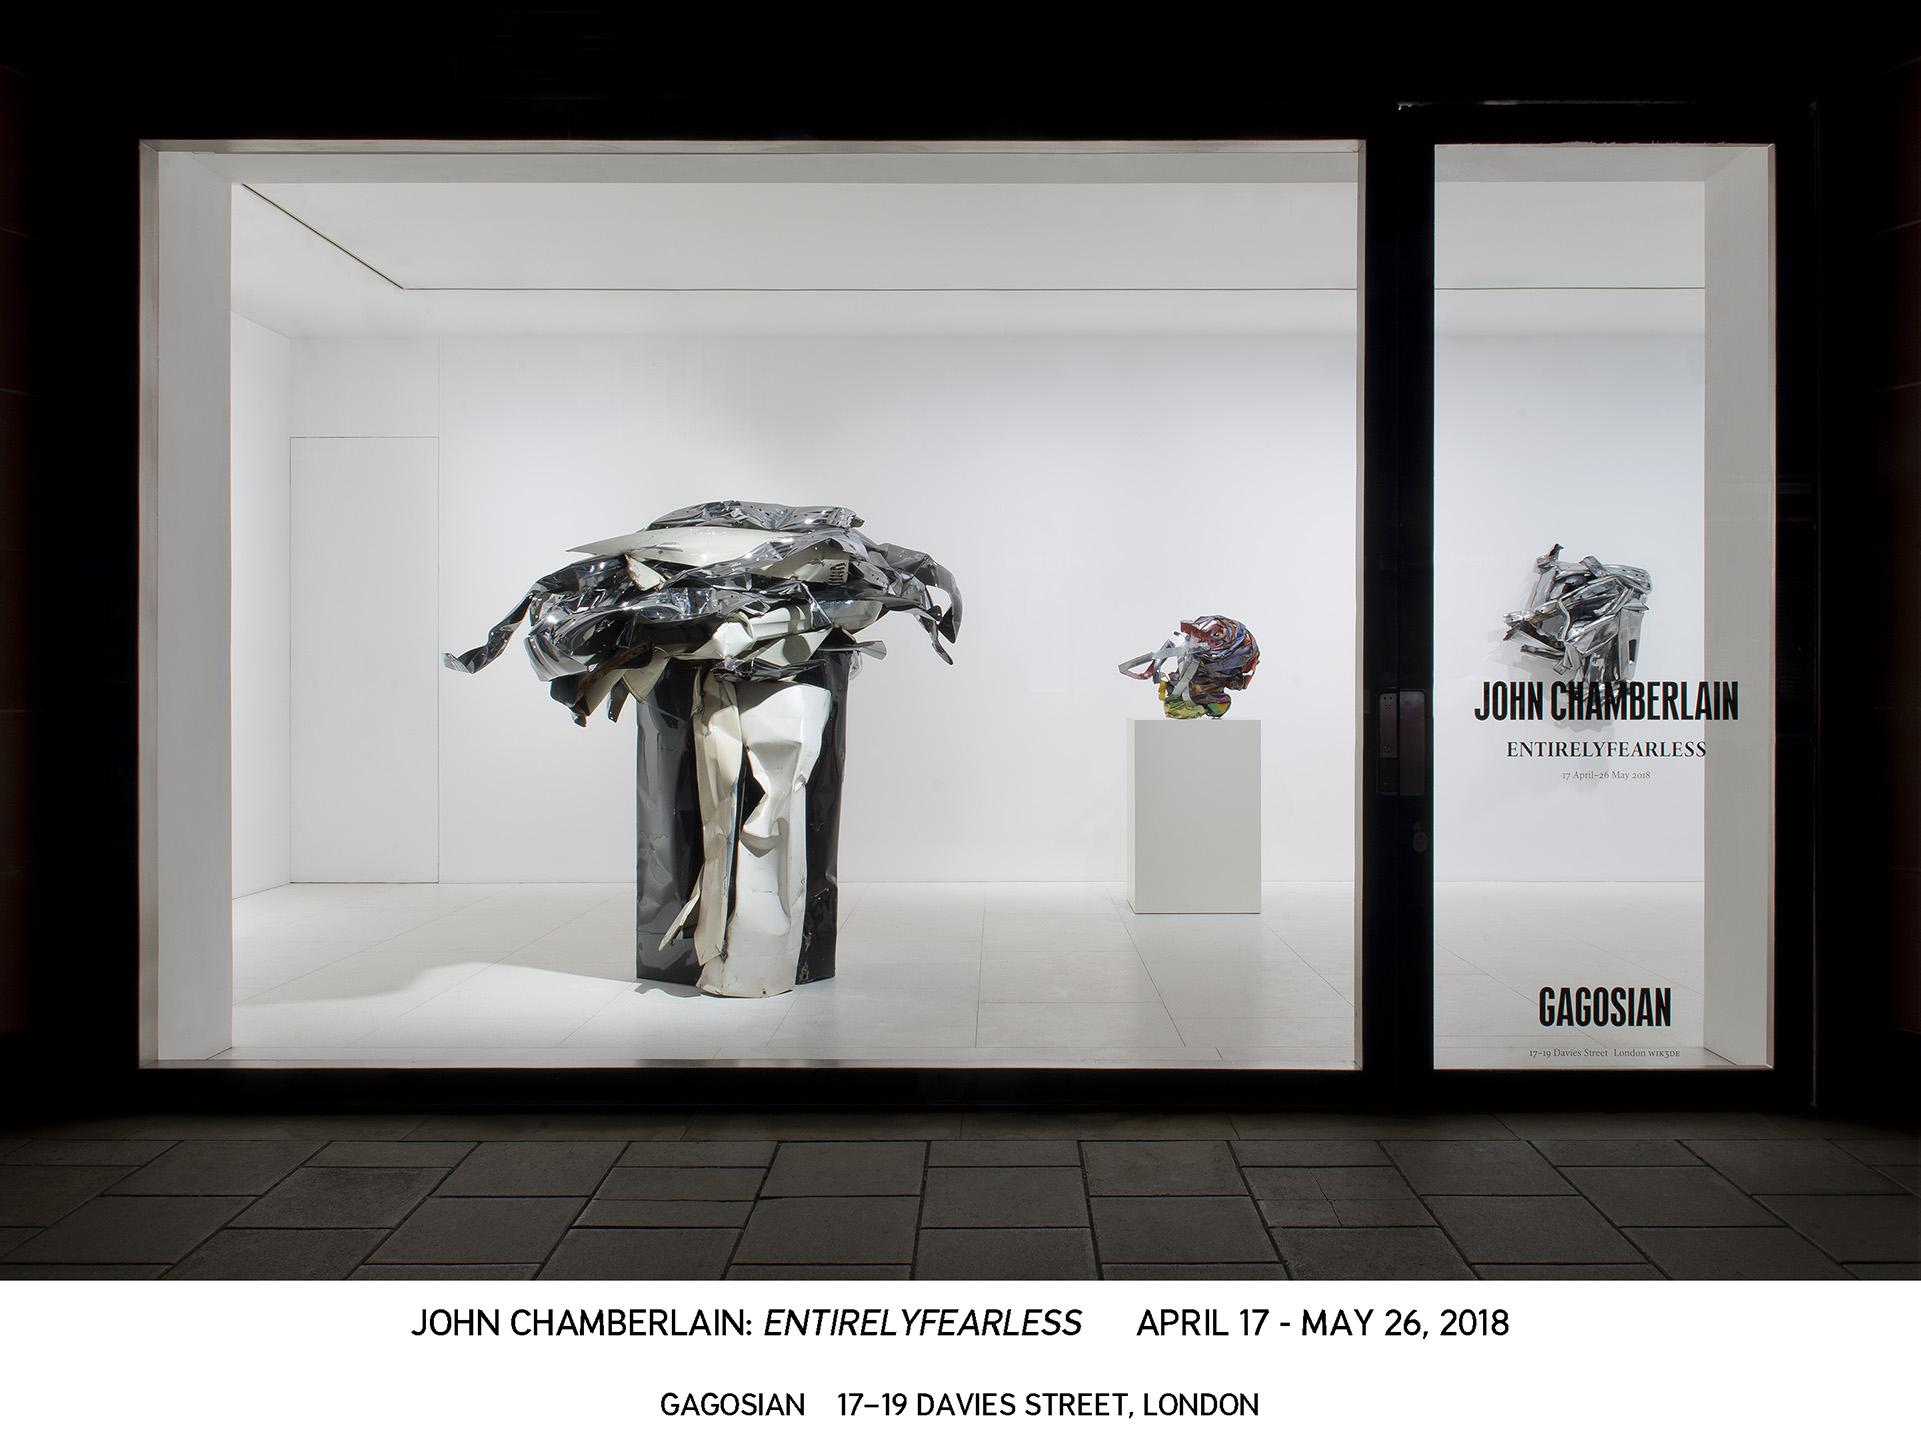 CHAMBERLAIN 2018 ENTIRELYFEARLESS Exterior view 2.jpg